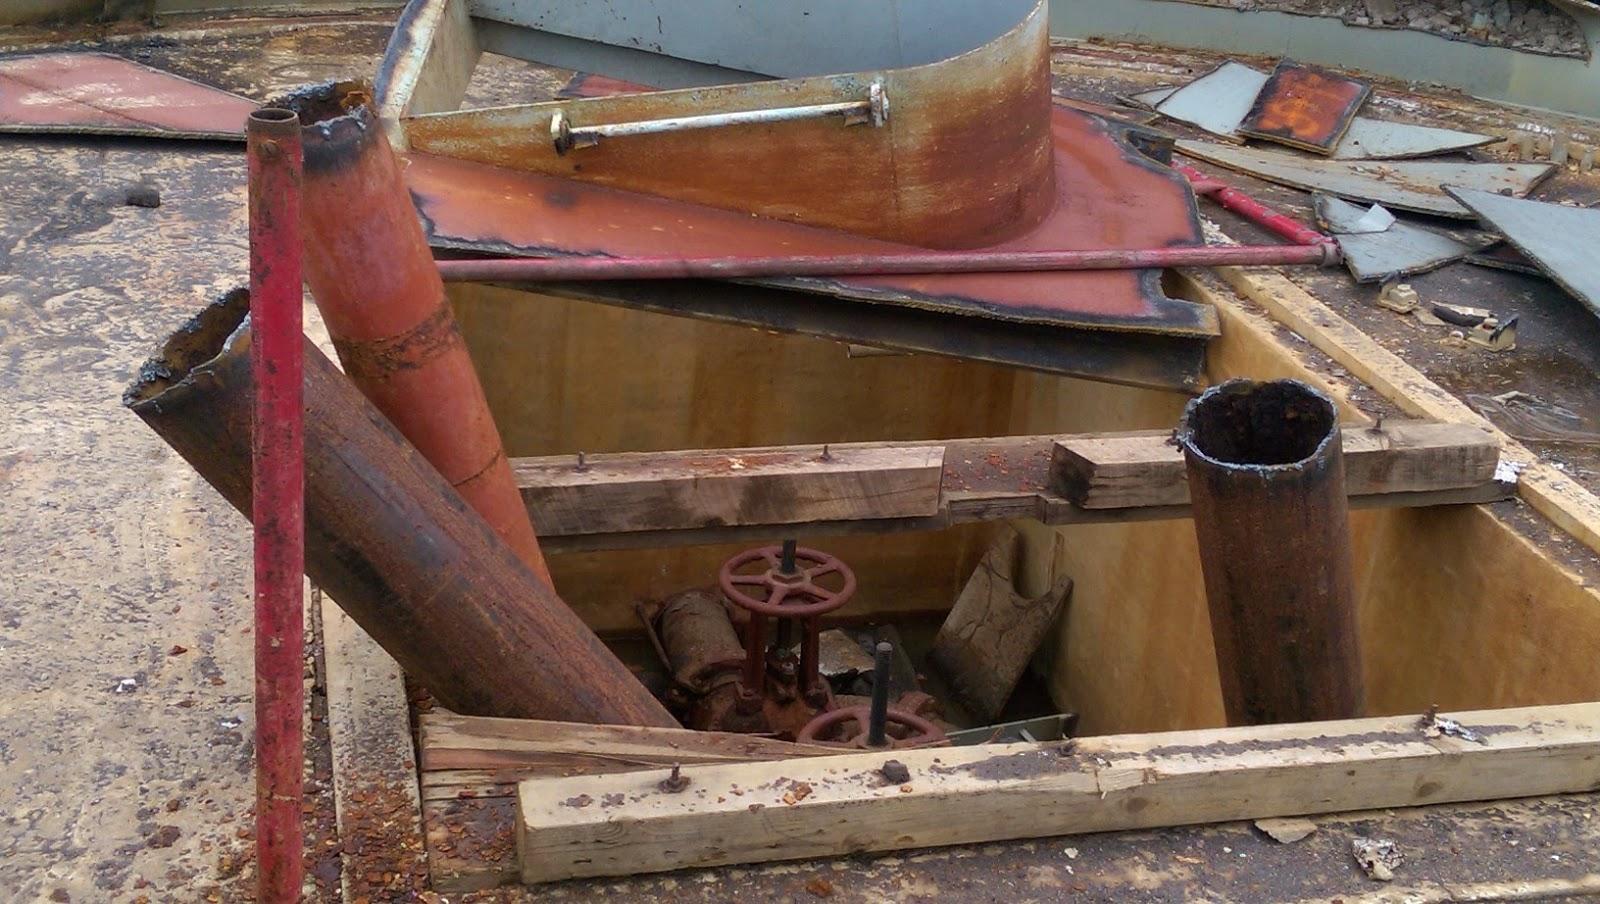 Windsor Water Tower Demolition : Pics of the demolished east windsor nj wyckoffs mill